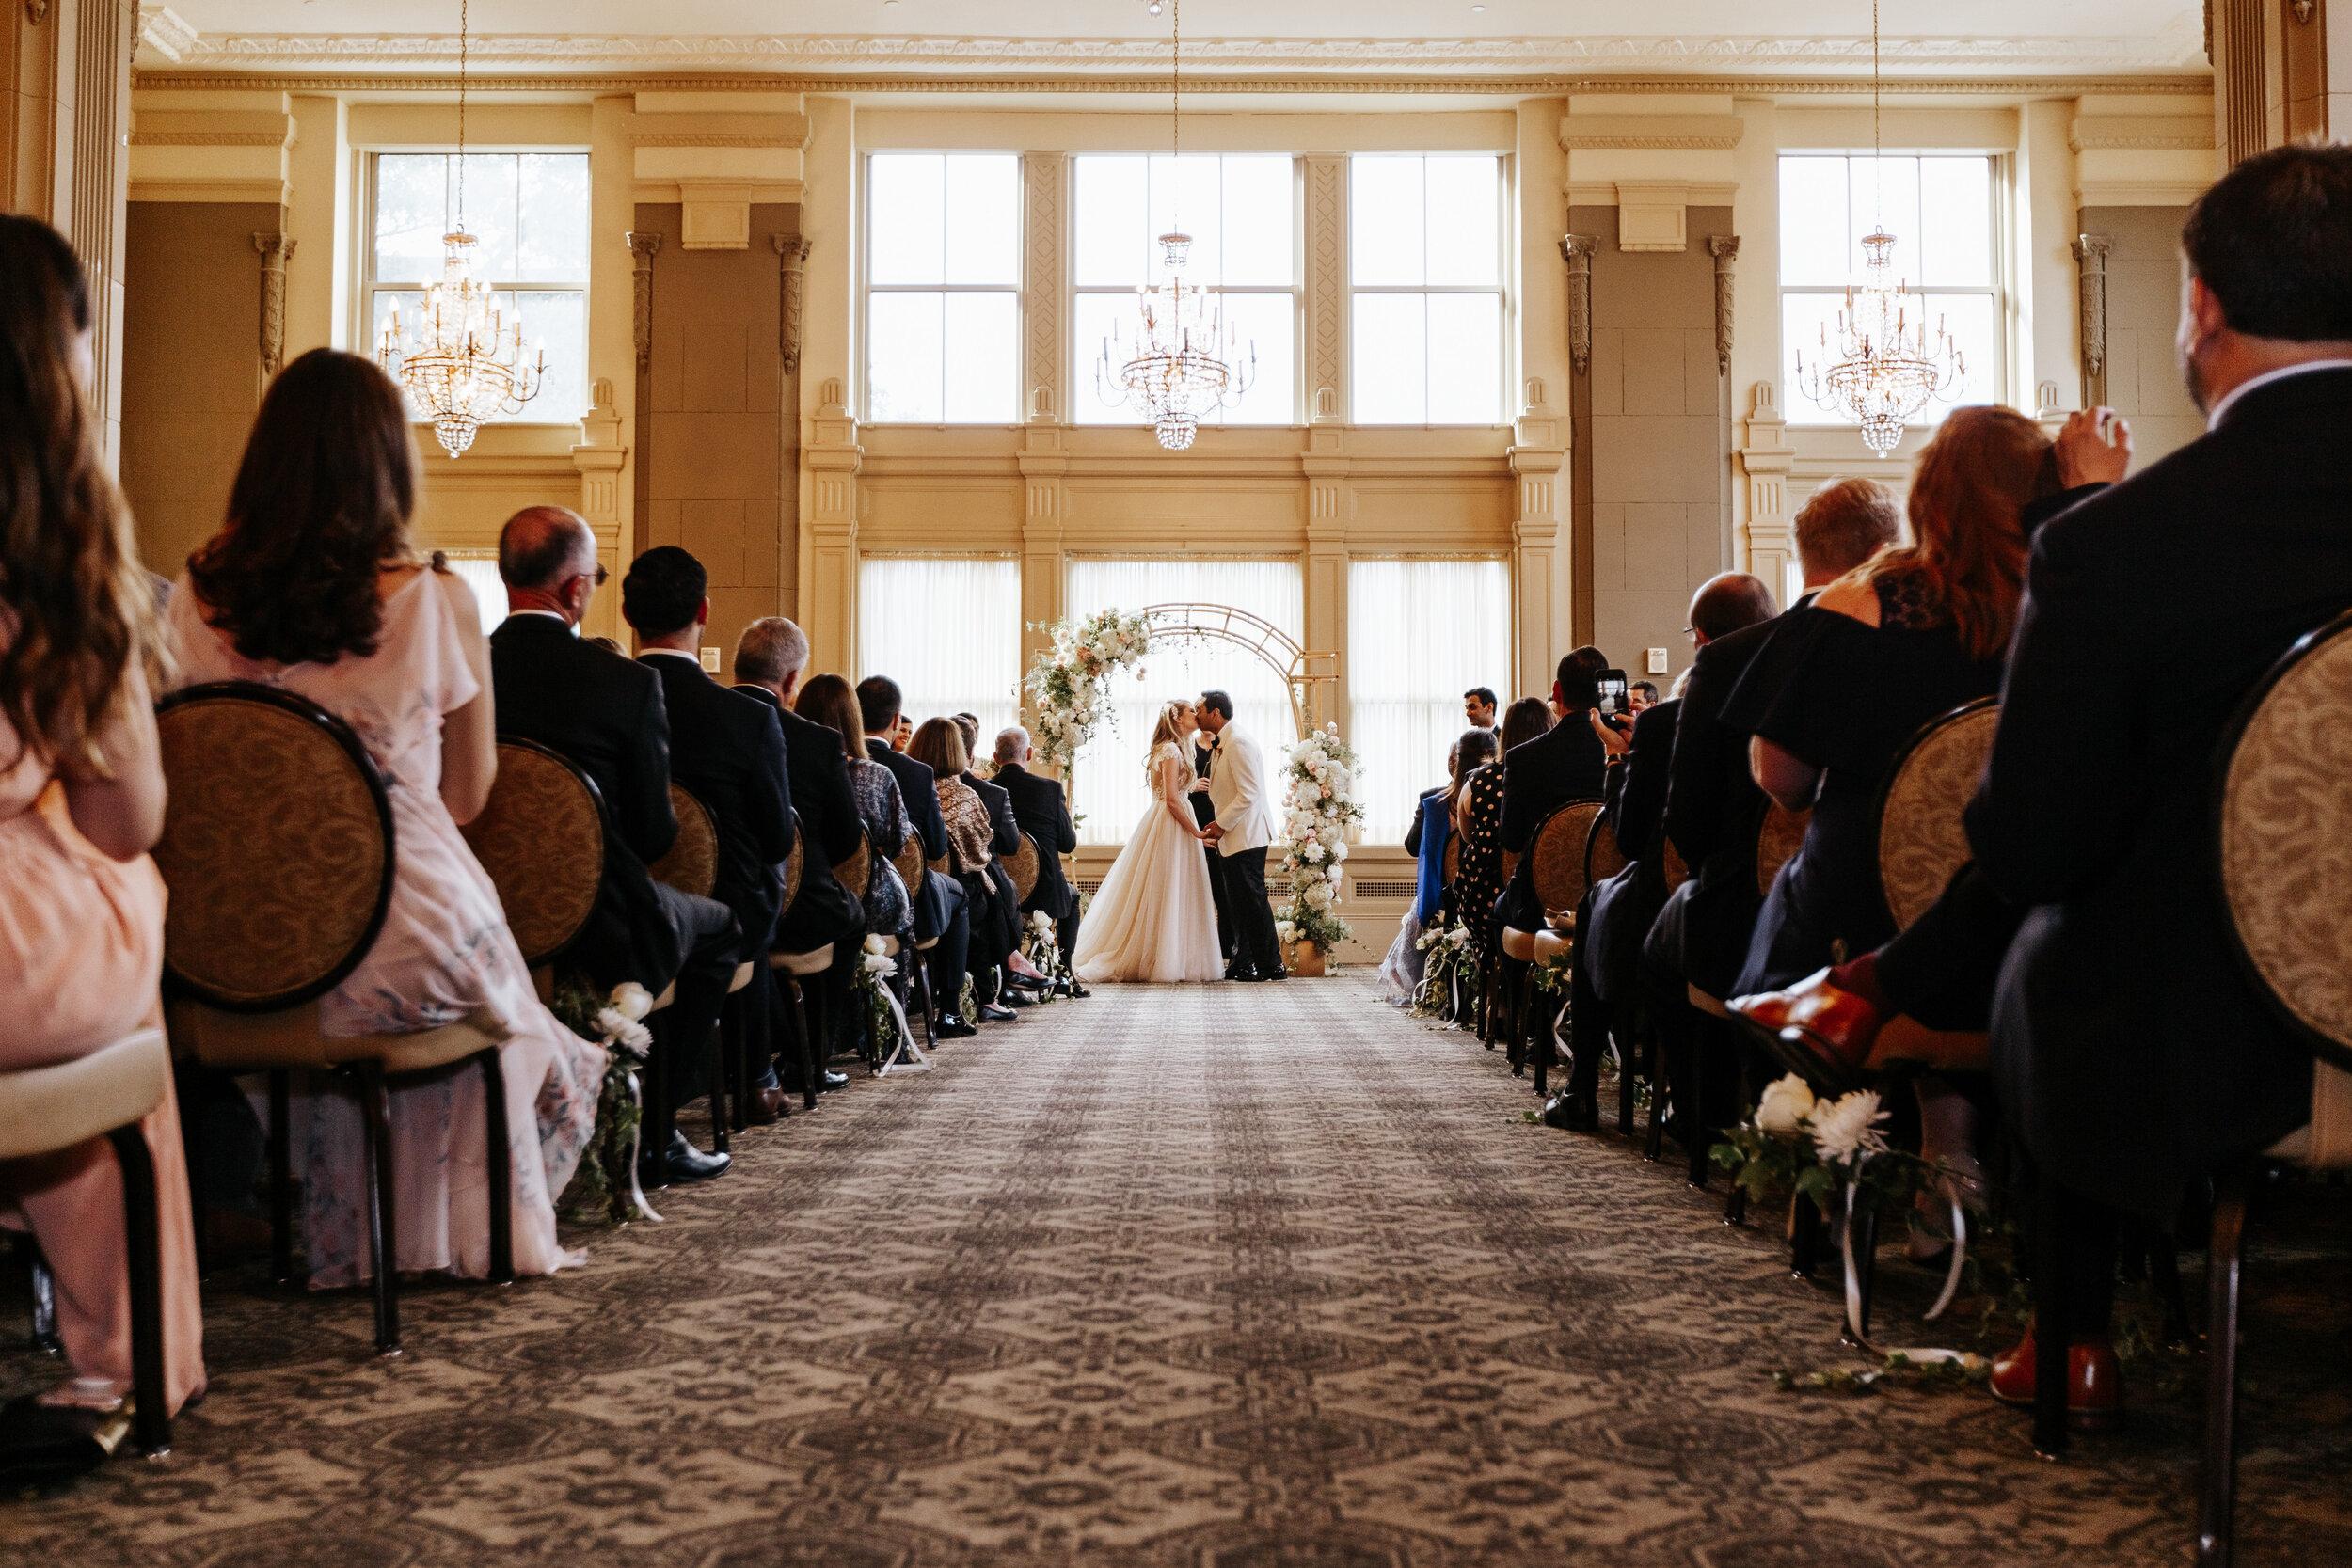 Cassie-Mrunal-Wedding-Quirk-Hotel-John-Marshall-Ballrooms-Richmond-Virginia-Photography-by-V-79.jpg